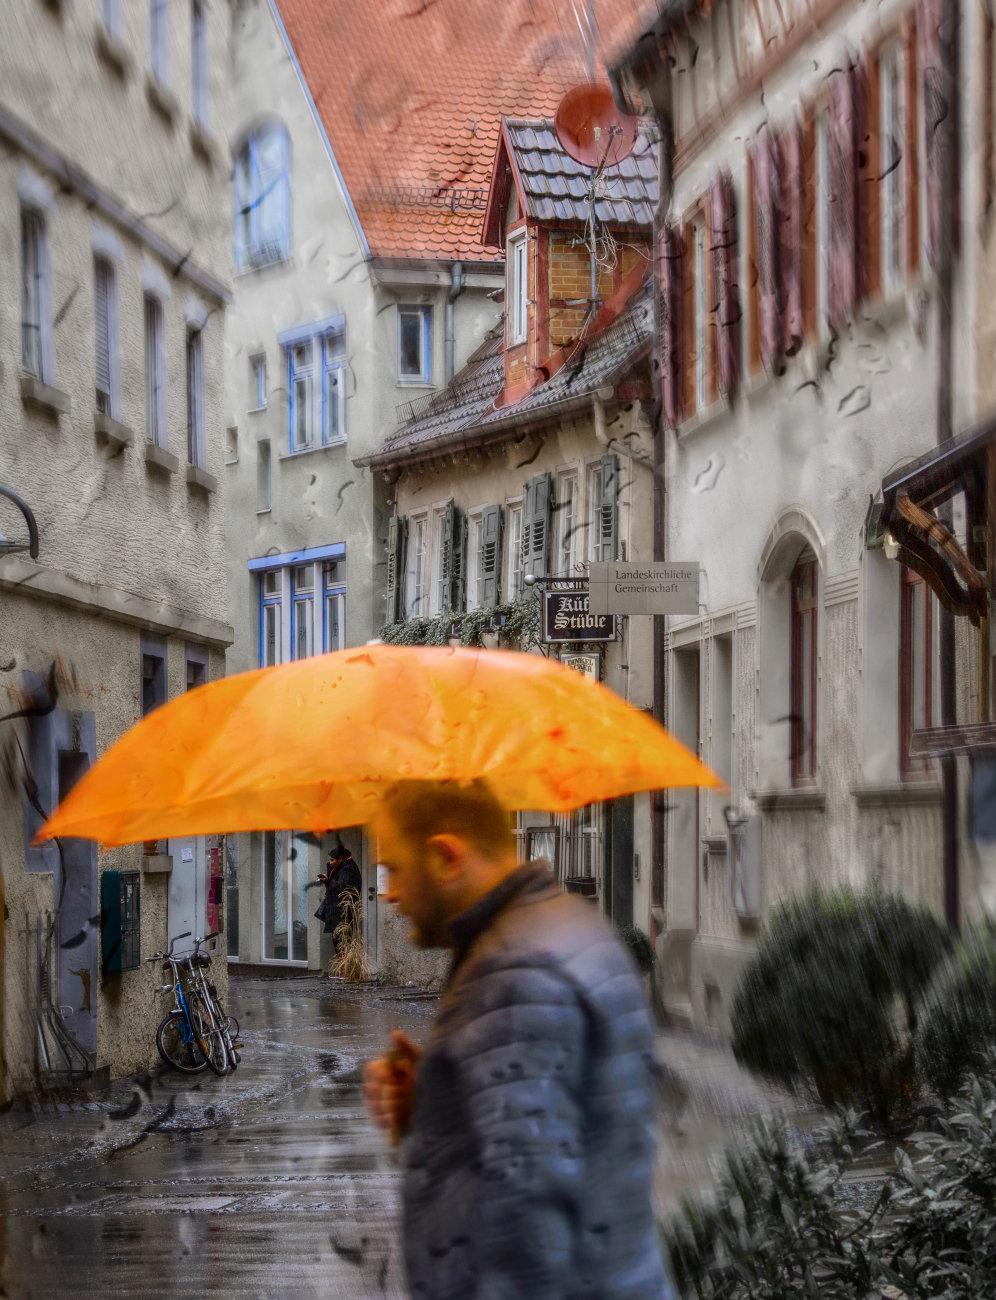 Rainy day in Stuttgart